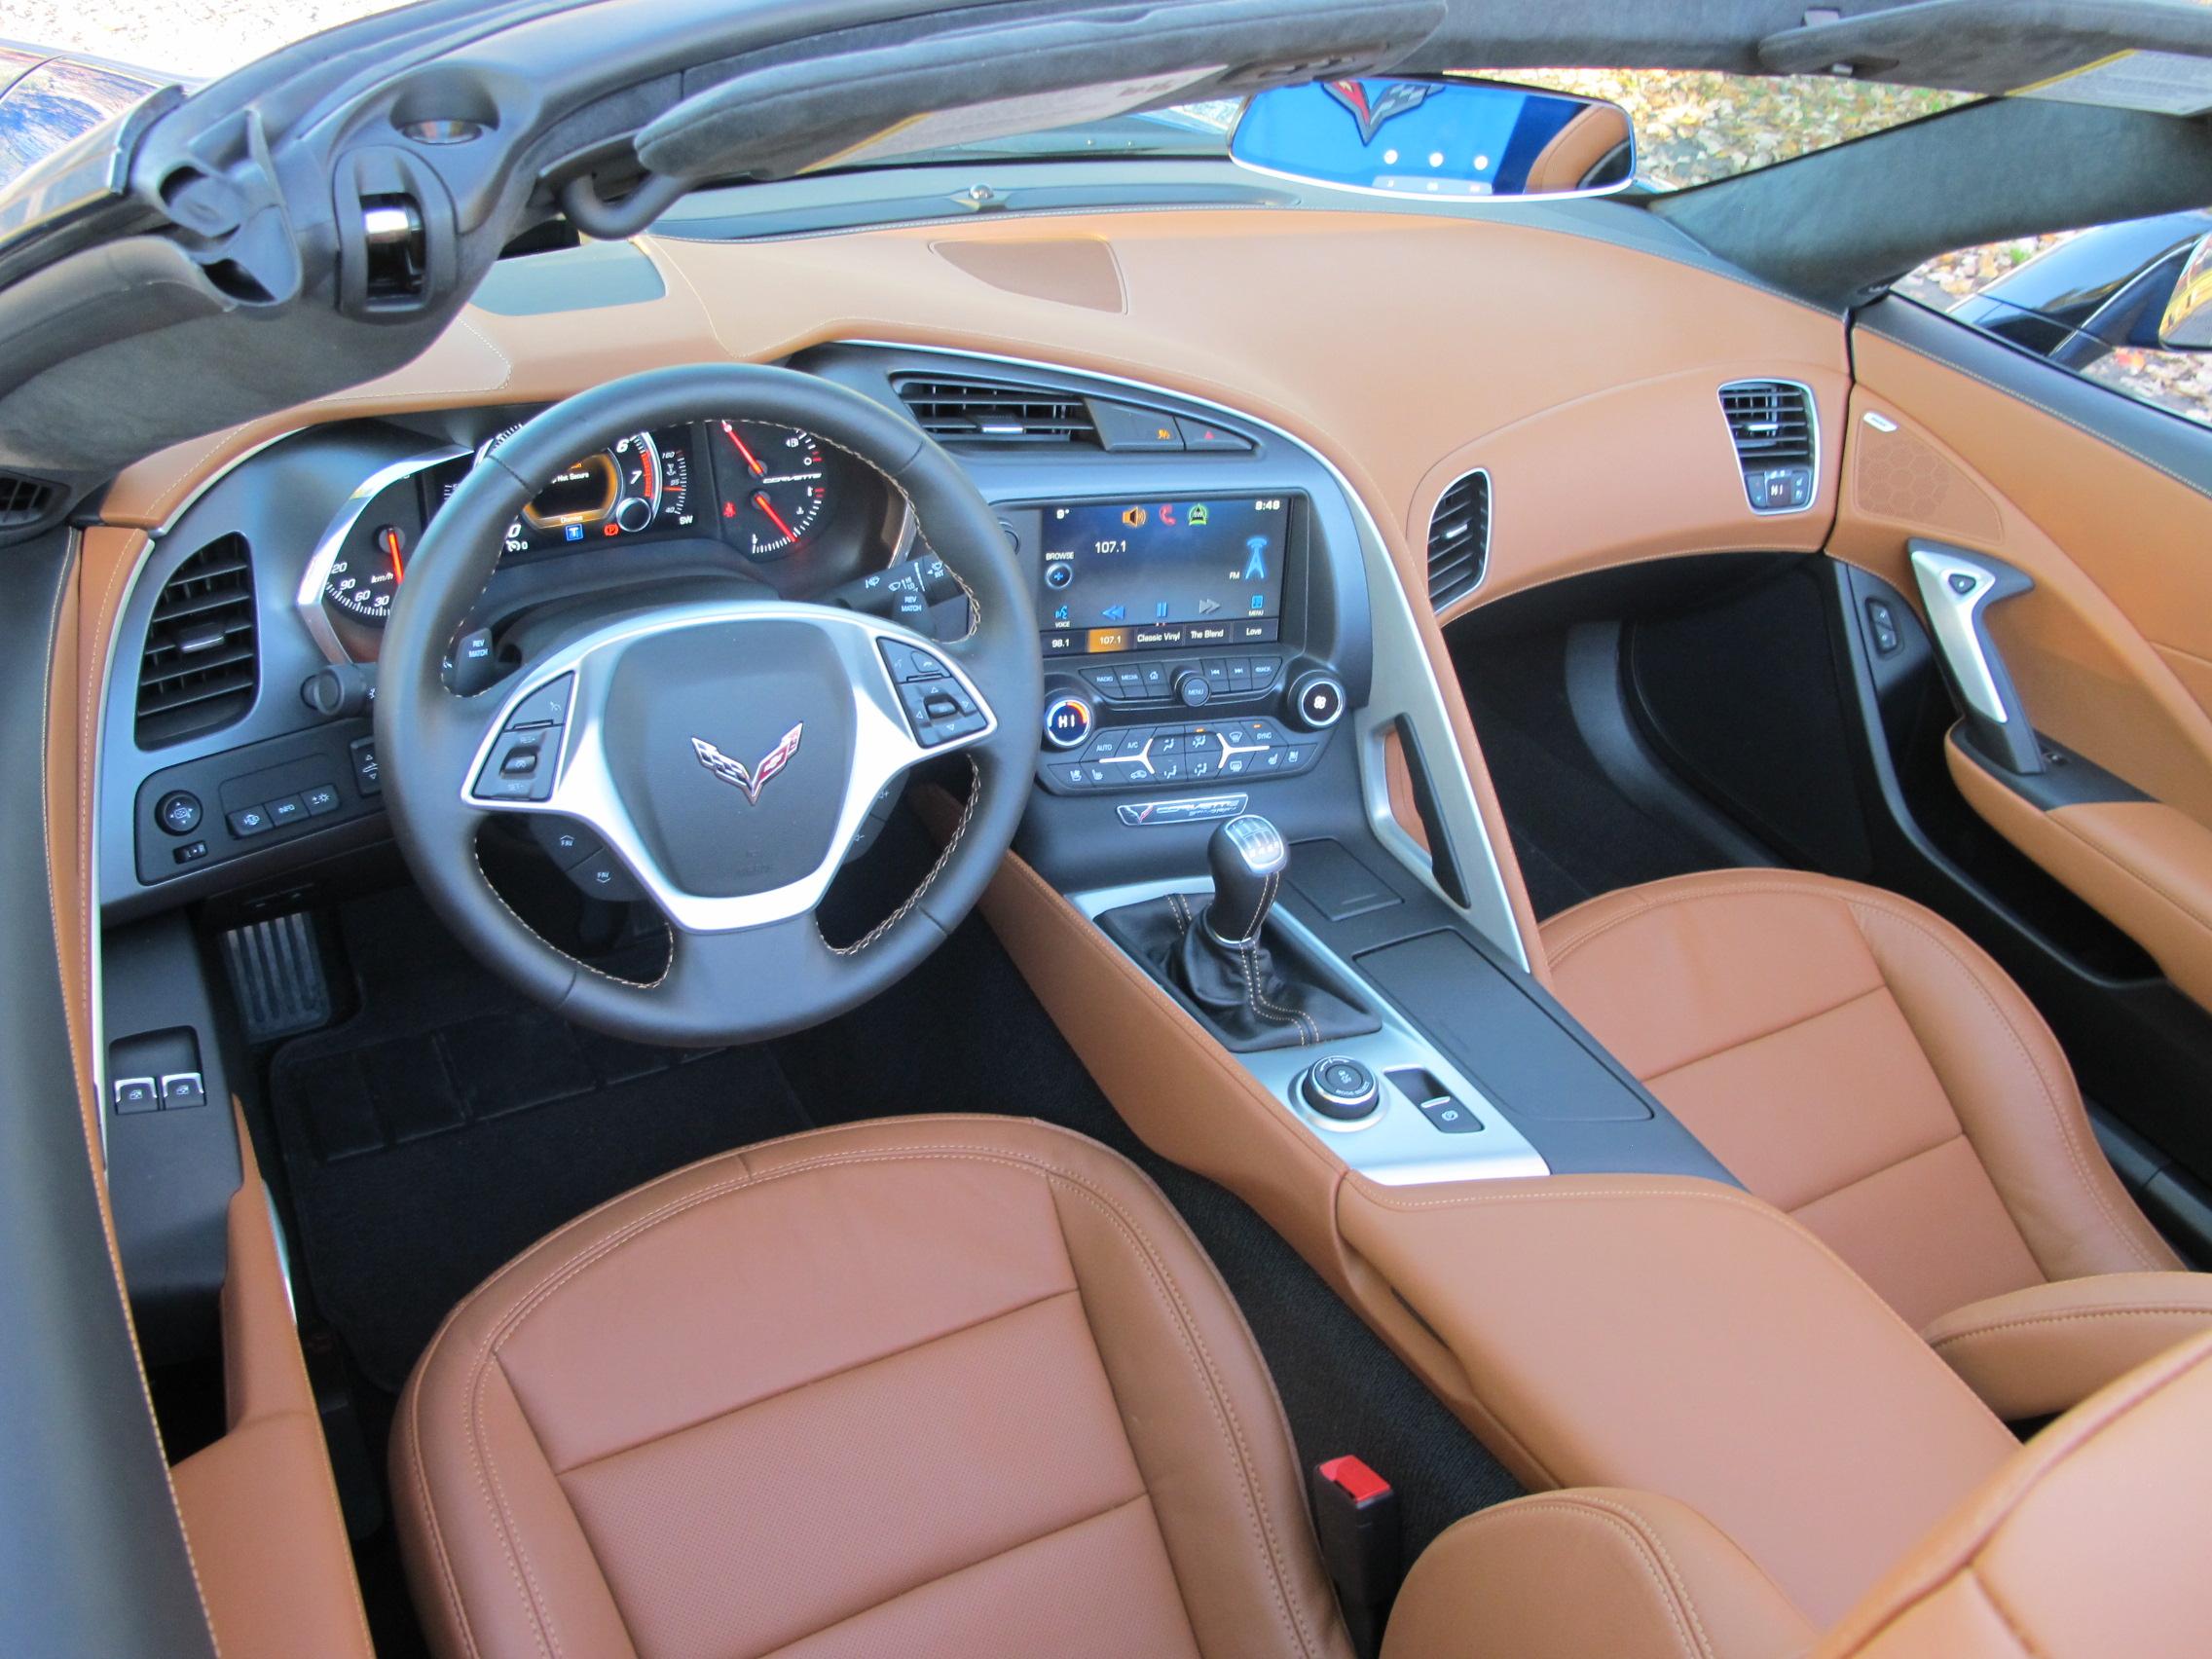 2015 Corvette Stingray Interior